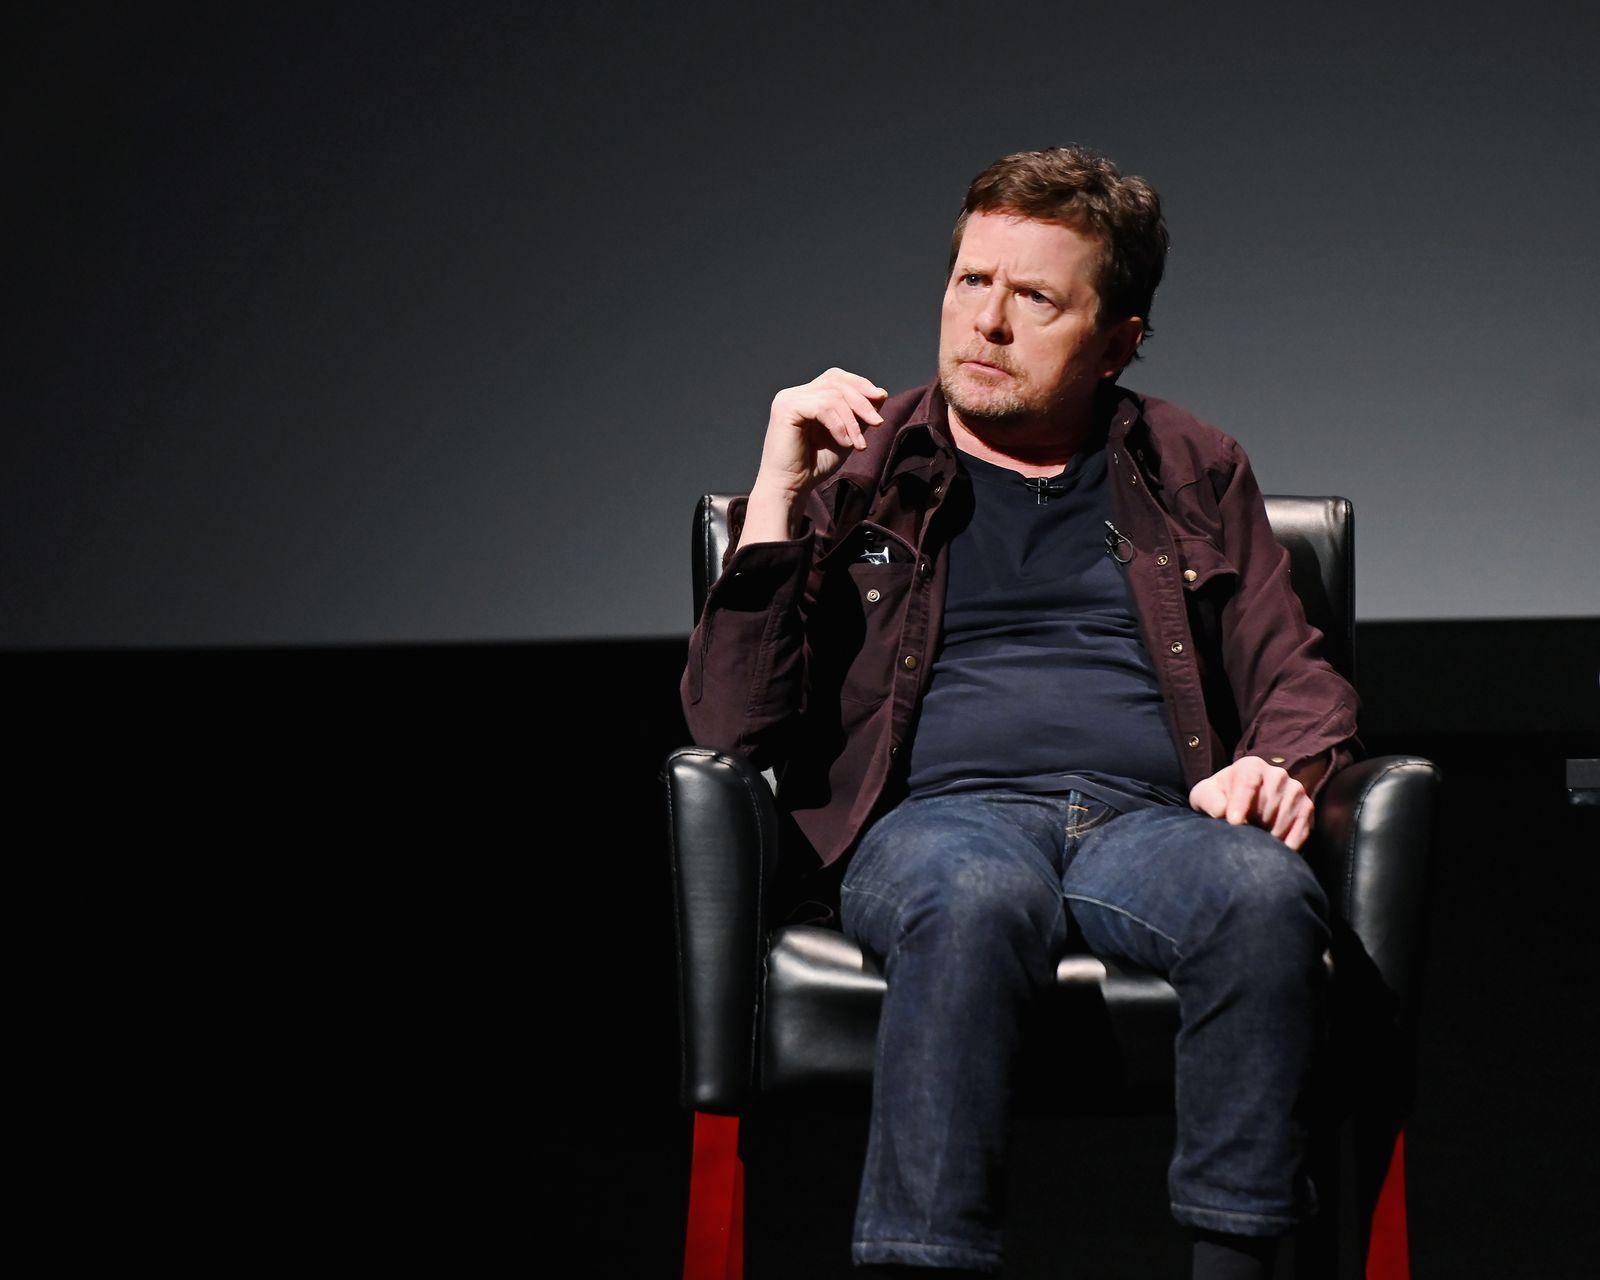 Tribeca Talks - Storytellers - Michael J. Fox With Denis Leary - 2019 Tribeca Film Festival